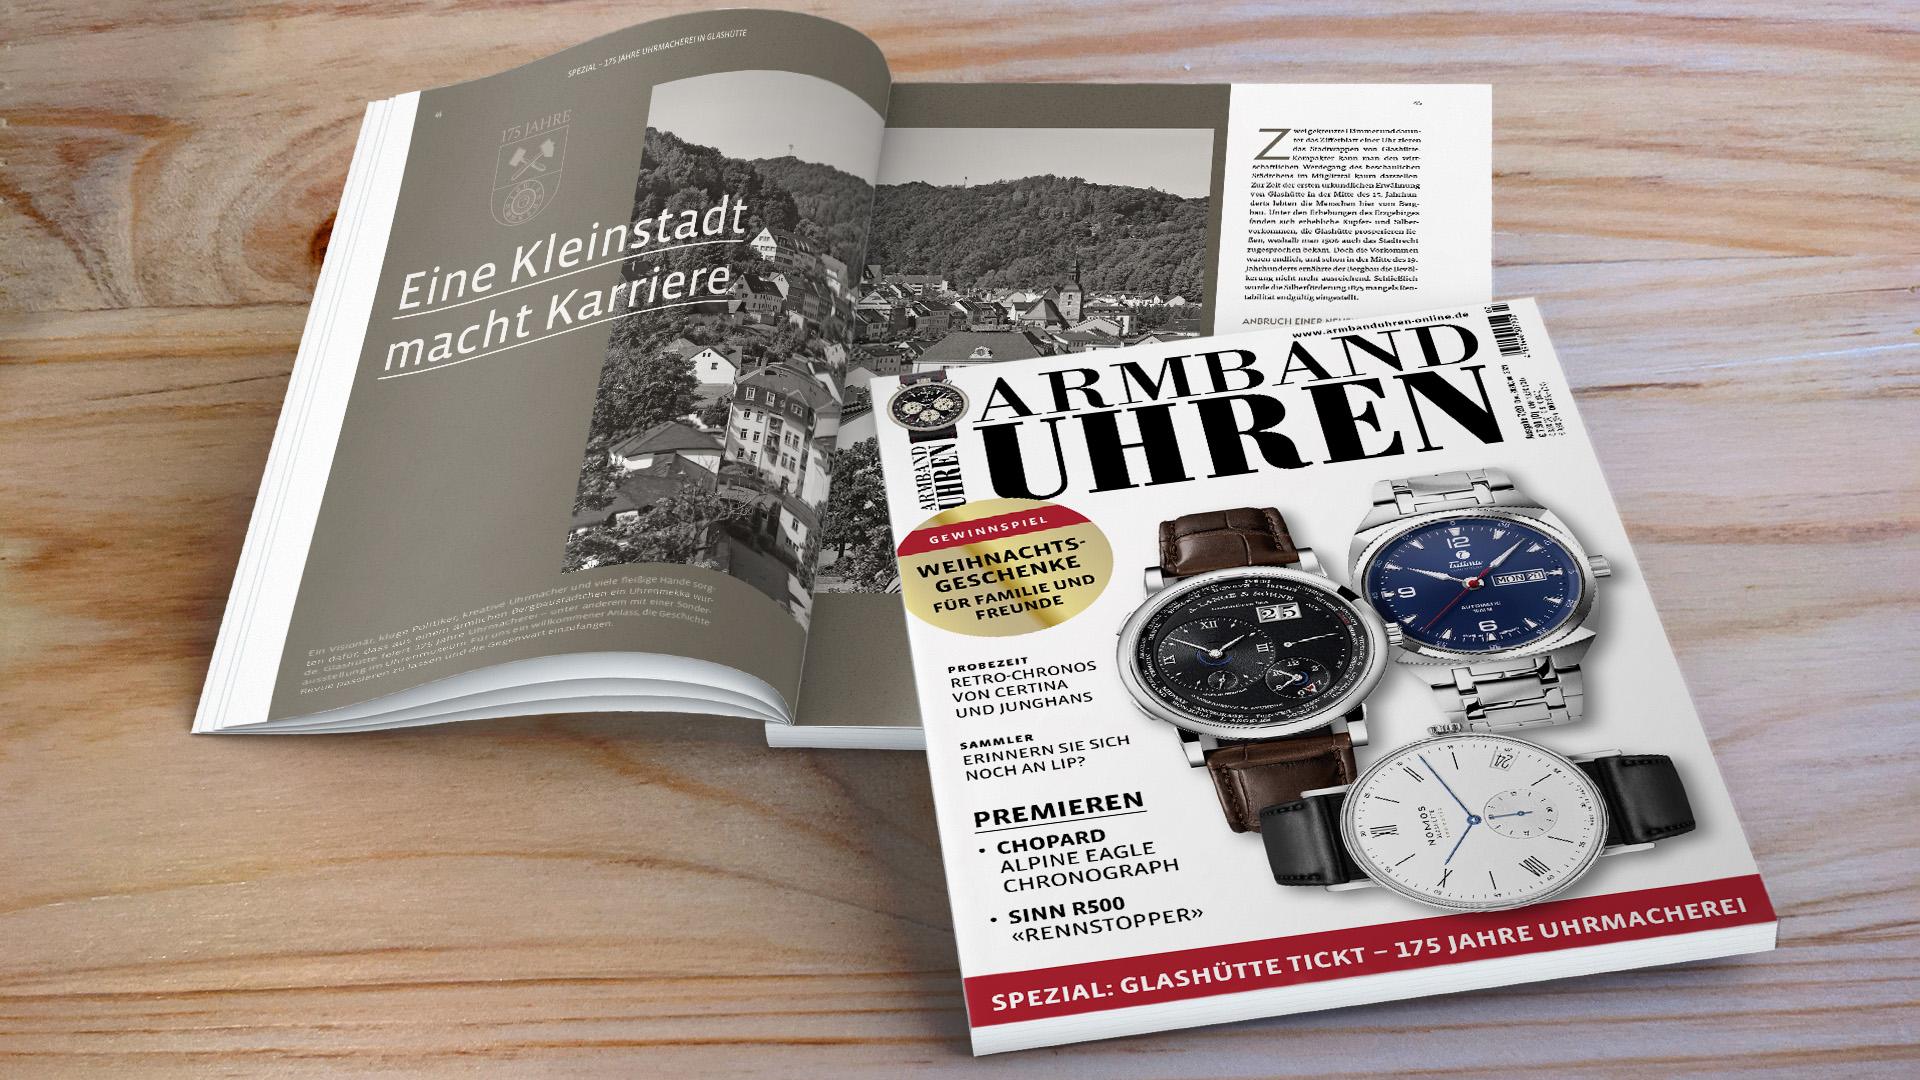 Armbanduhren 175 Jahre Glashütte